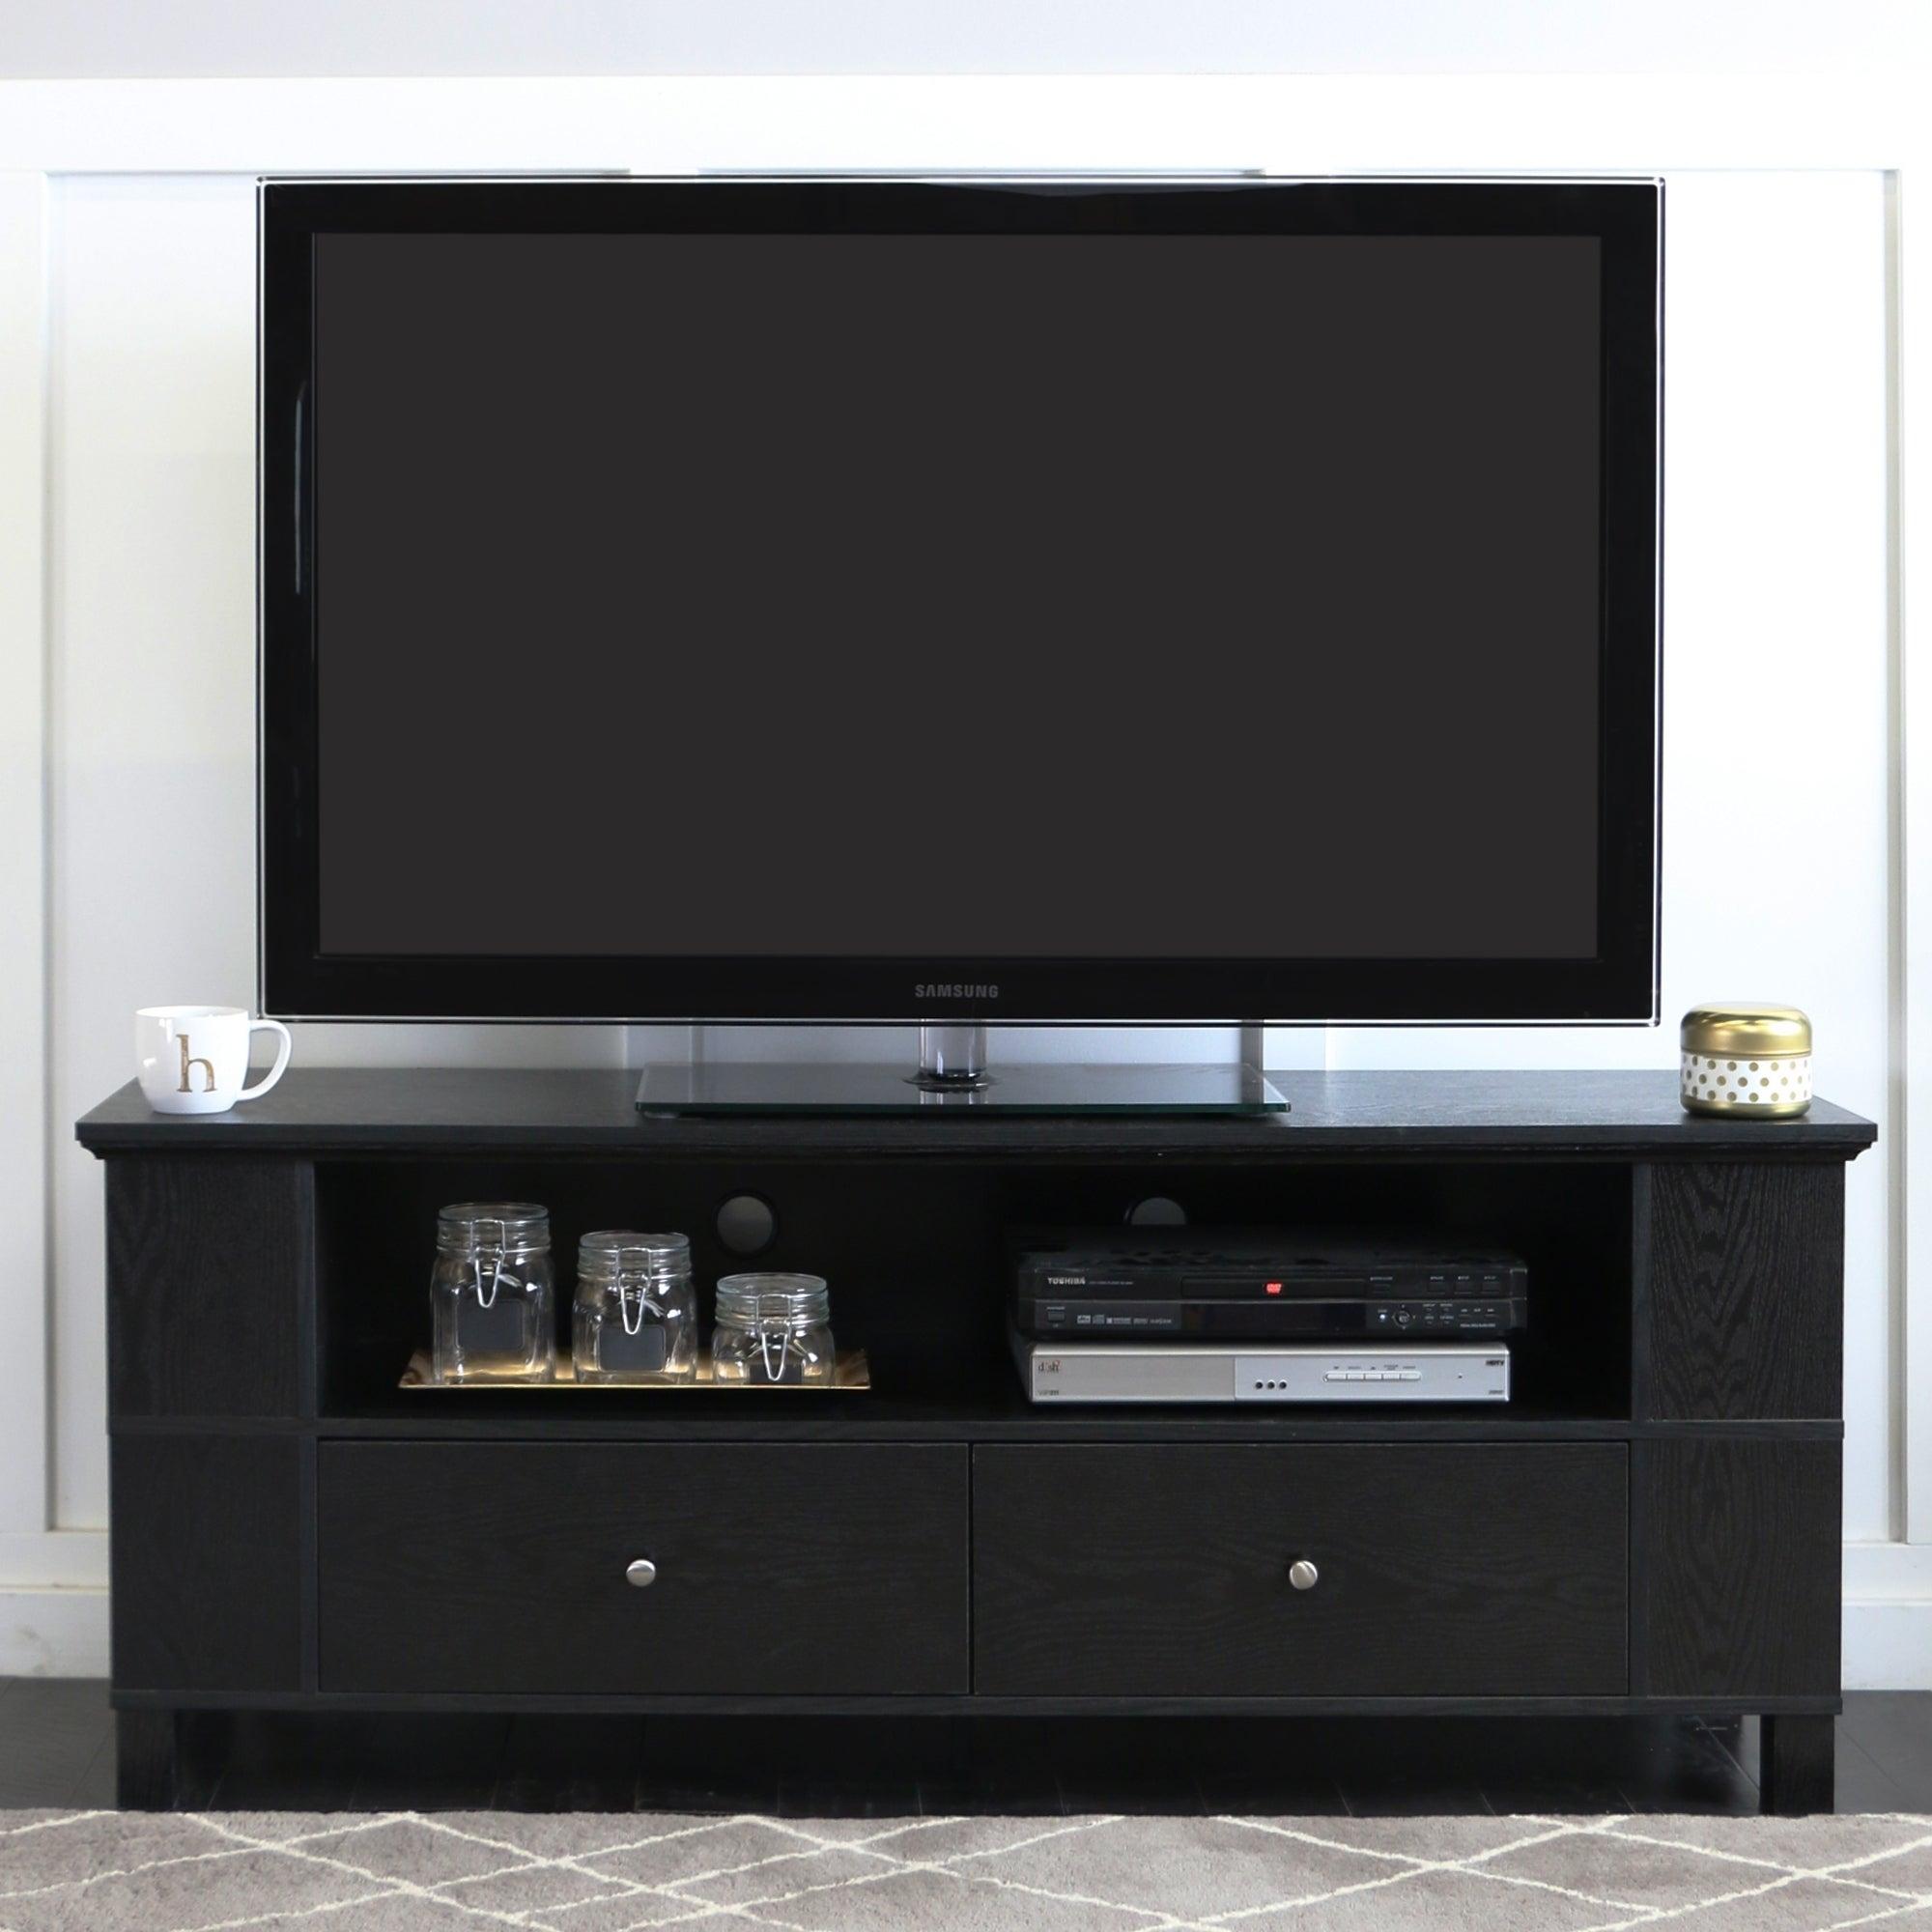 59 Tv Stand Storage Console Black 60 X 16 X 23h 812492014881 Ebay